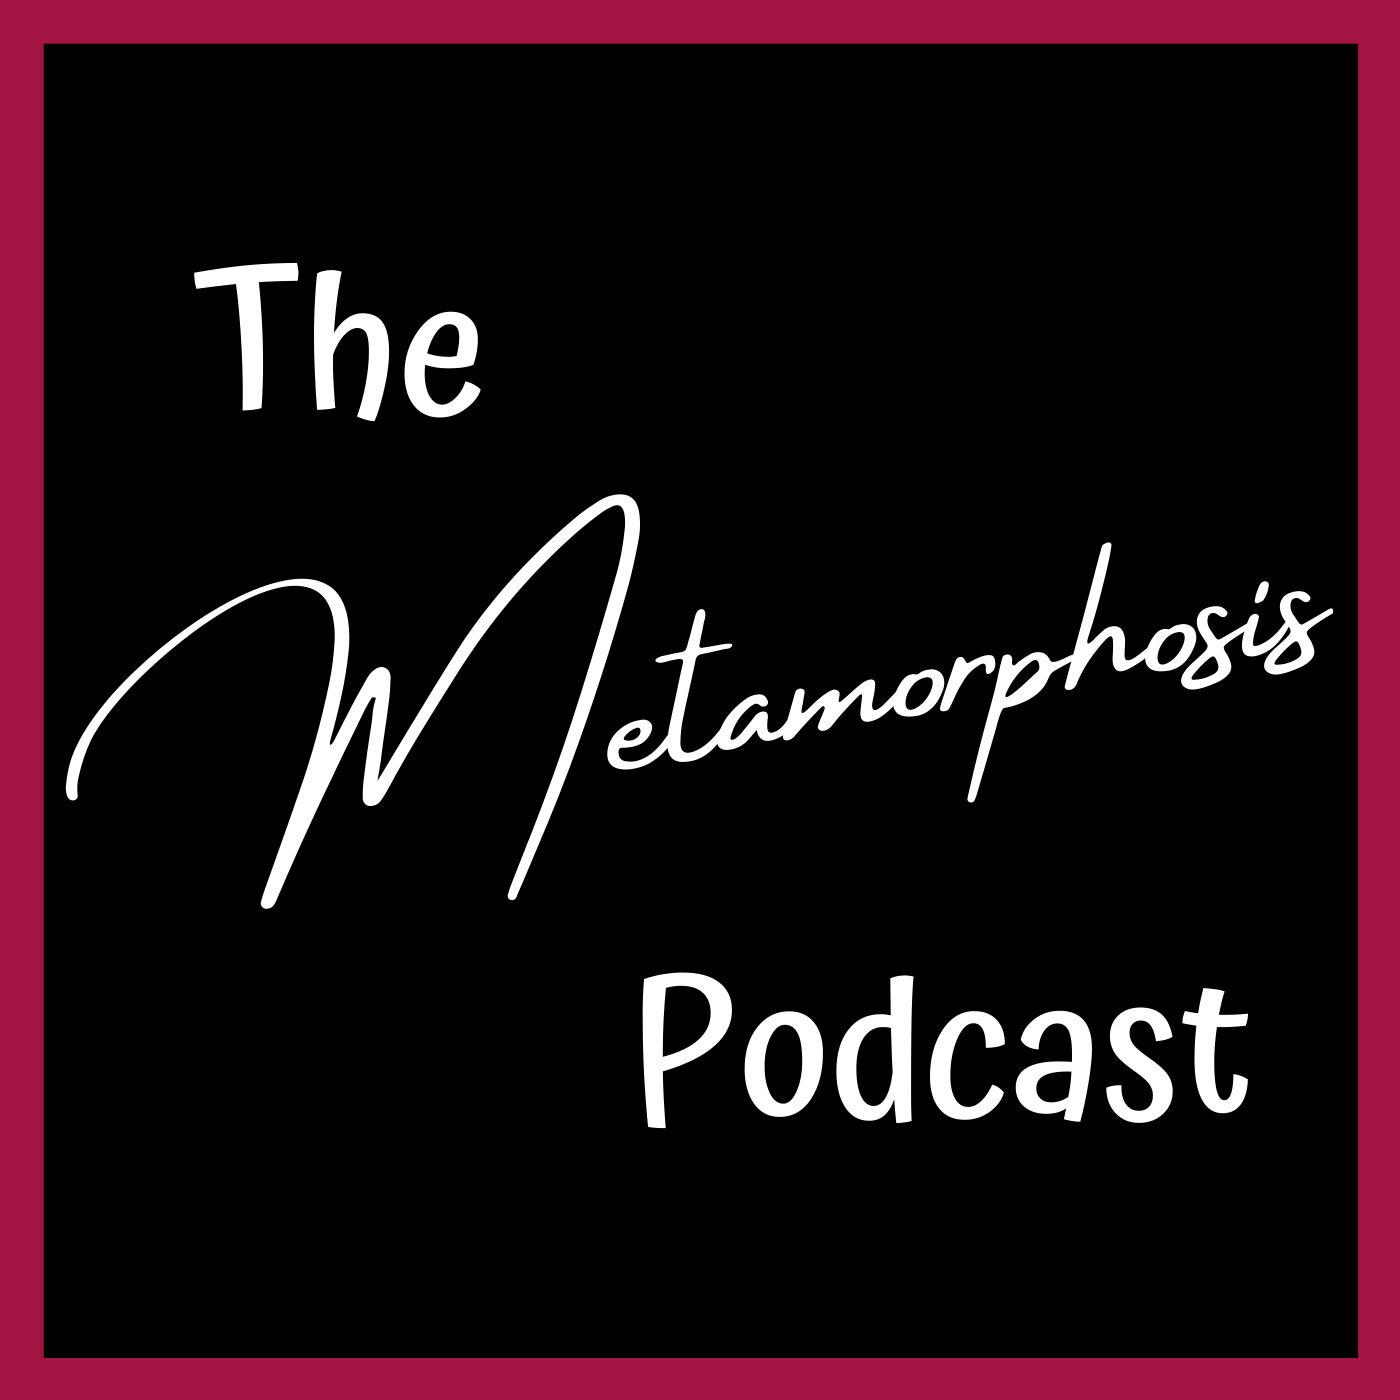 The Metamorphosis Podcast Trailer